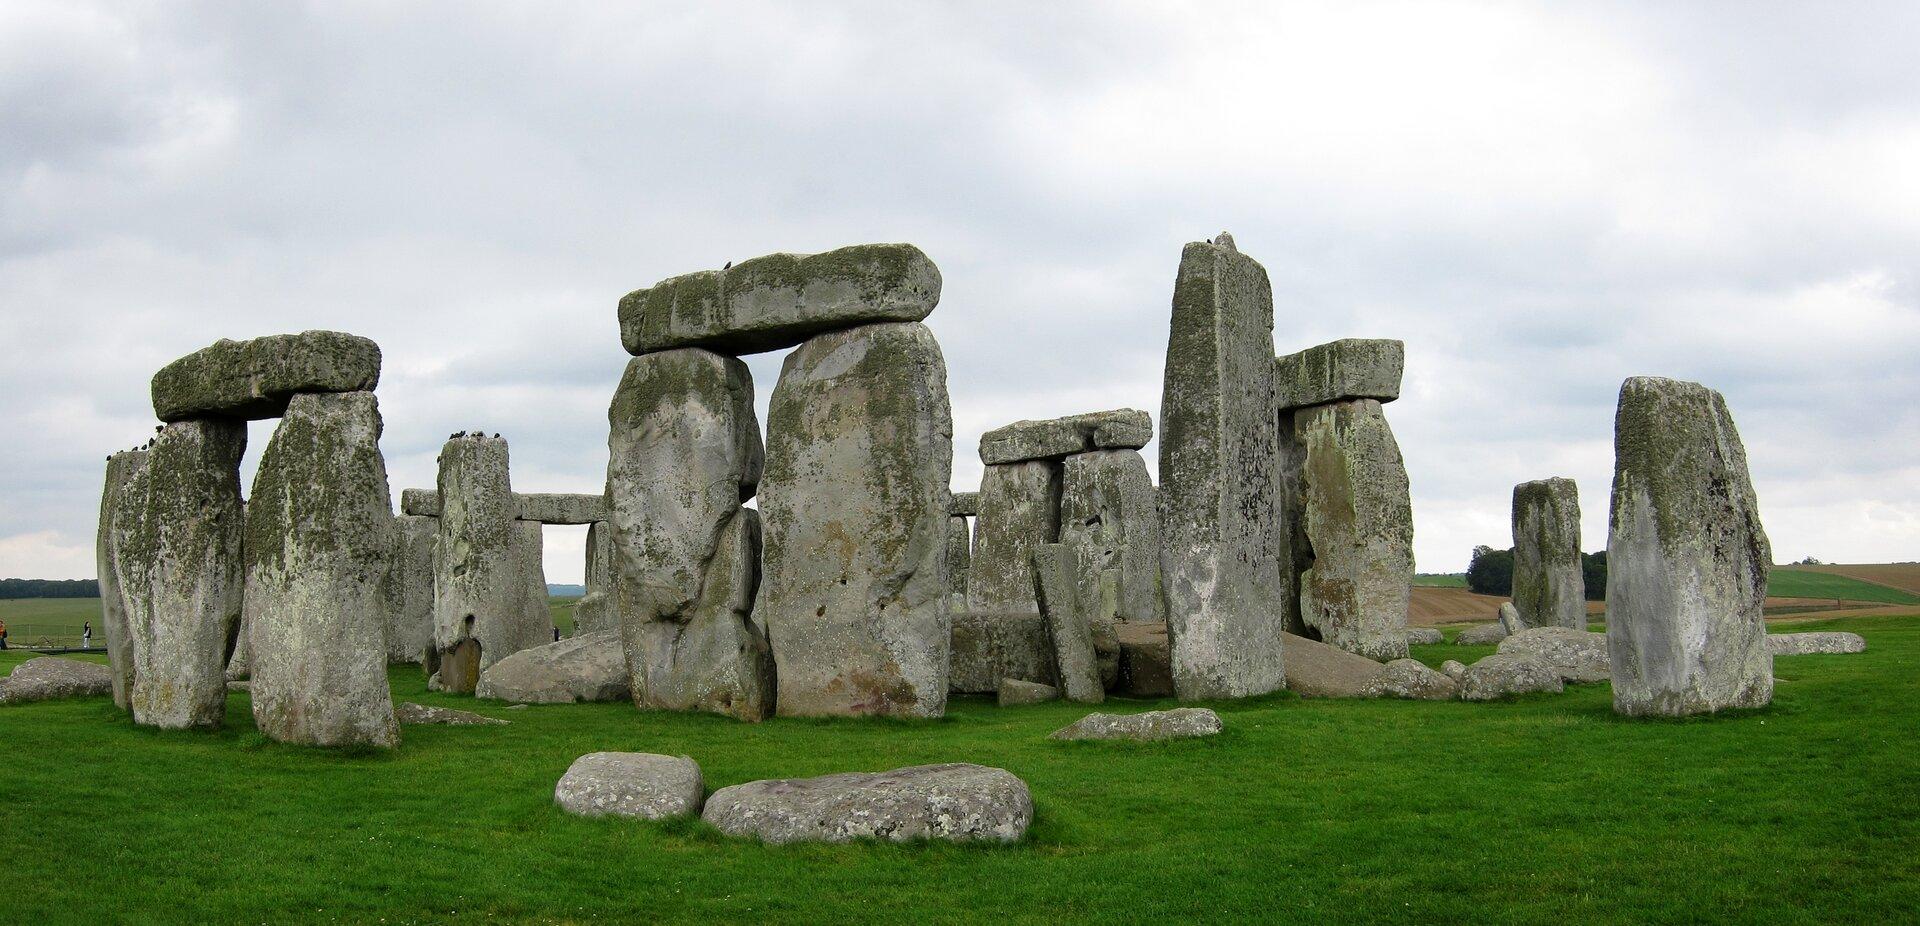 Stonehenge, Anglia Stonehenge, Anglia Źródło: Velvet, fotografia barwna, licencja: CC BY-SA 3.0.